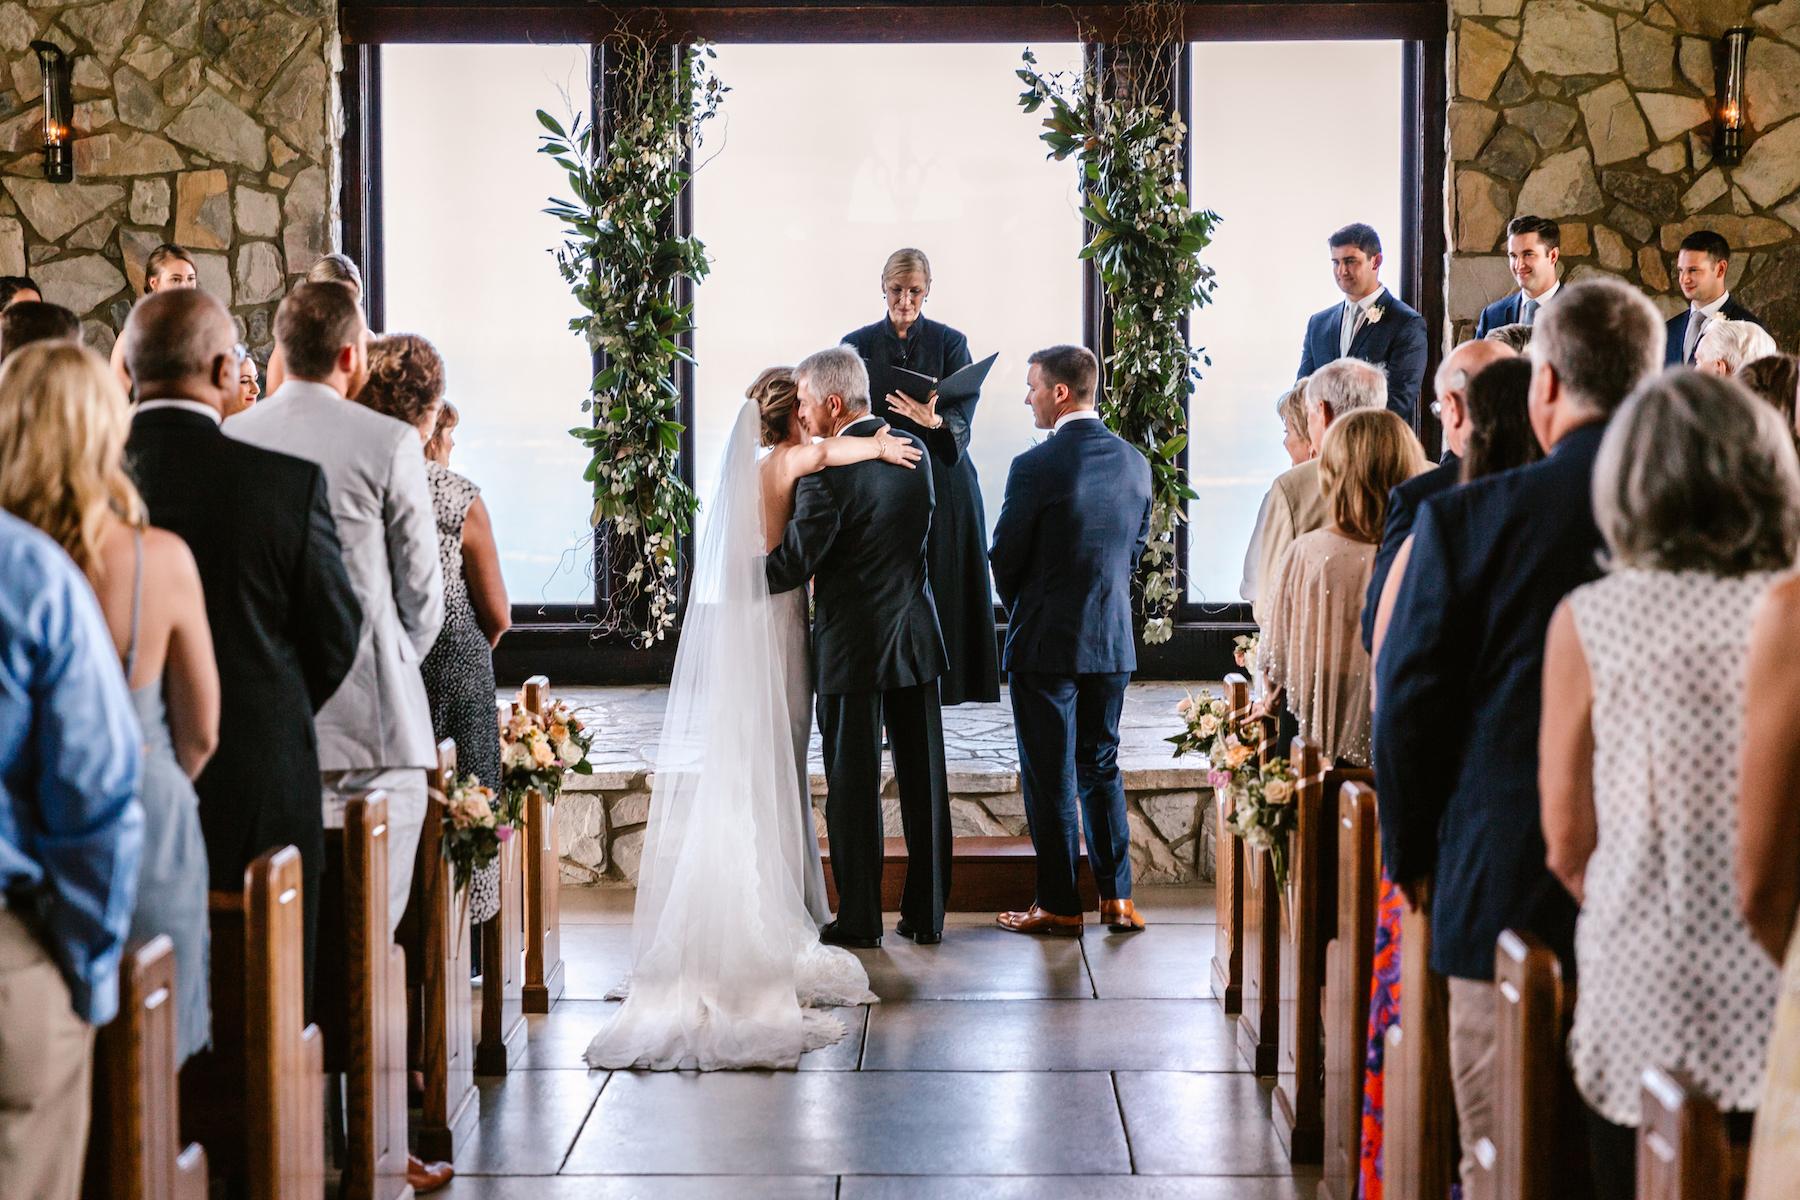 wedding-engagement-photographer-spartanburg-greenville-columbia-carolina-south-north-485.JPG